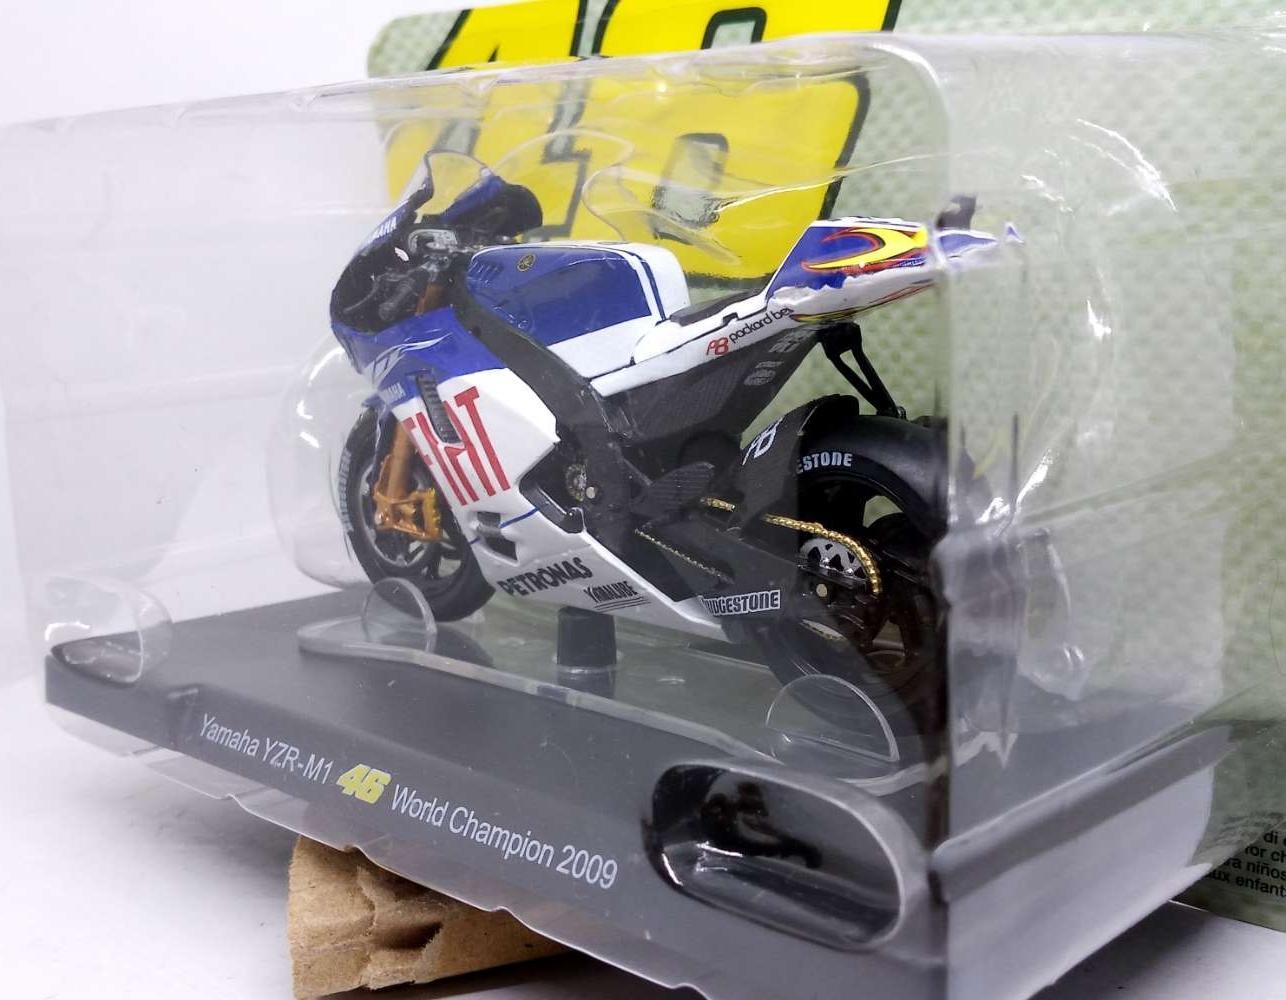 ... Diecast Miniatur Motogp Yamaha YZR-M1 VR46 World Champion 2009 - 3